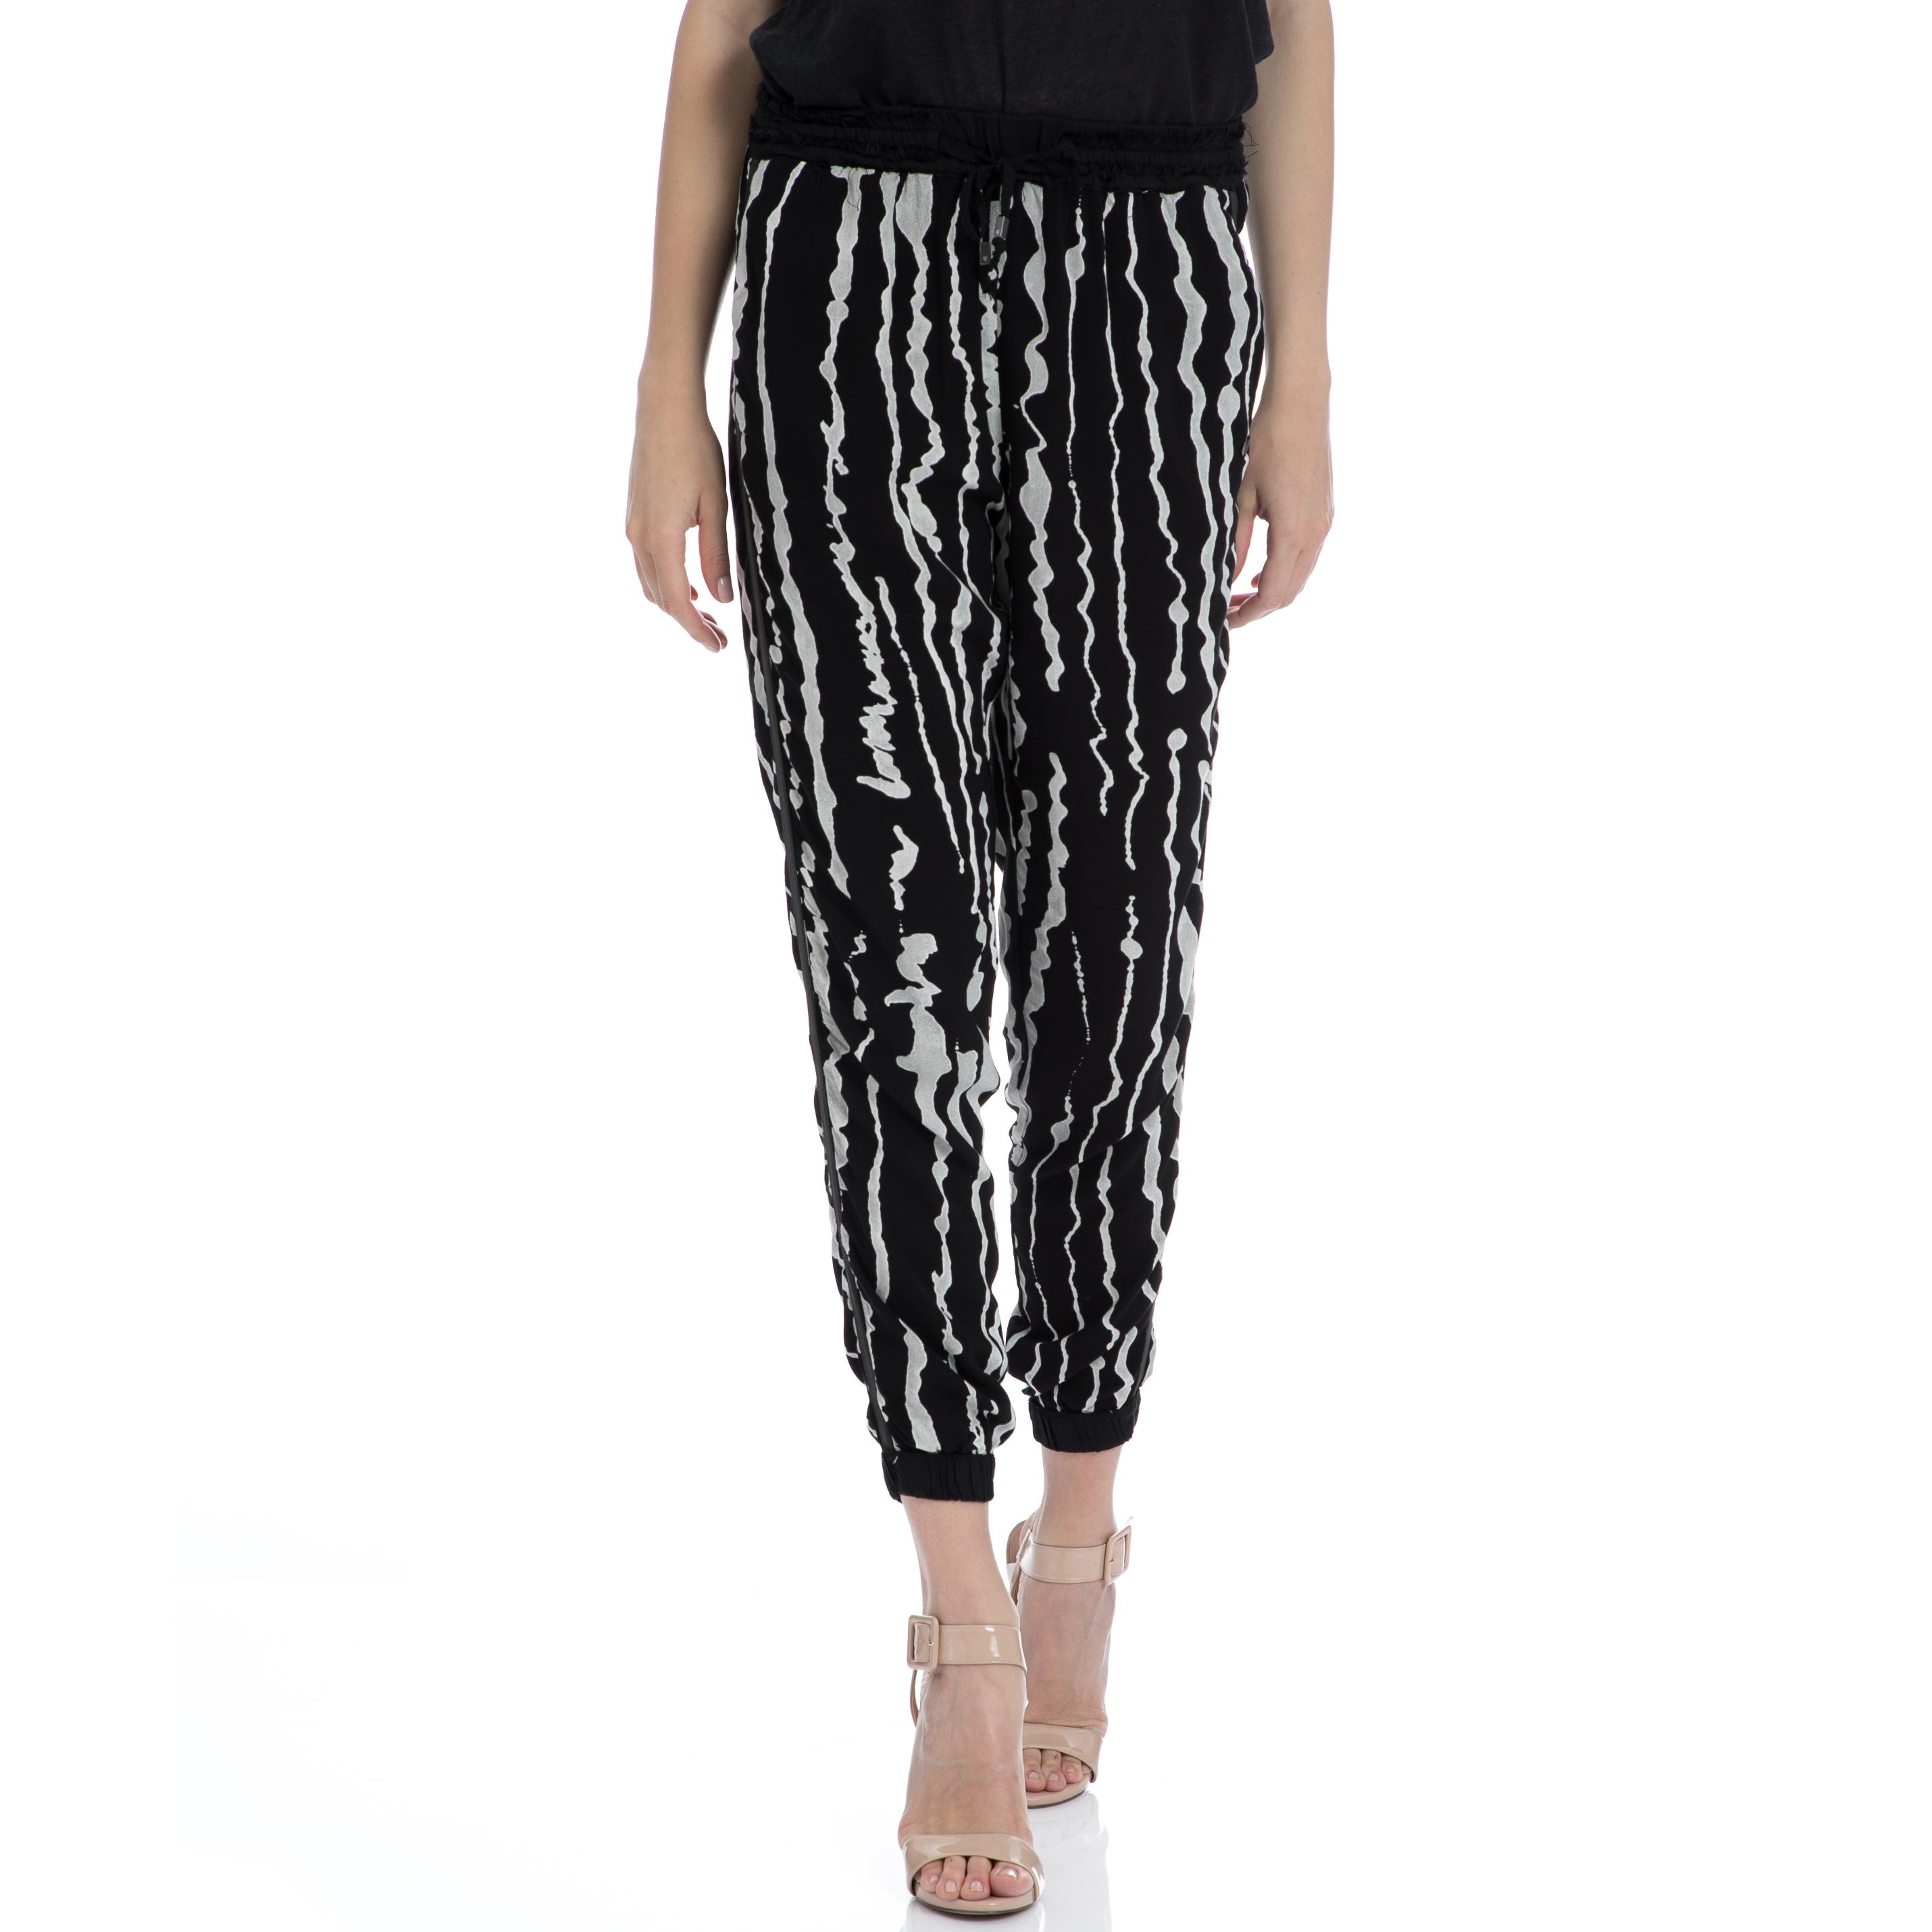 GARCIA JEANS - Γυναικείο παντελόνι Garcia Jeans μαύρο-γκρι γυναικεία ρούχα παντελόνια παντελόνες